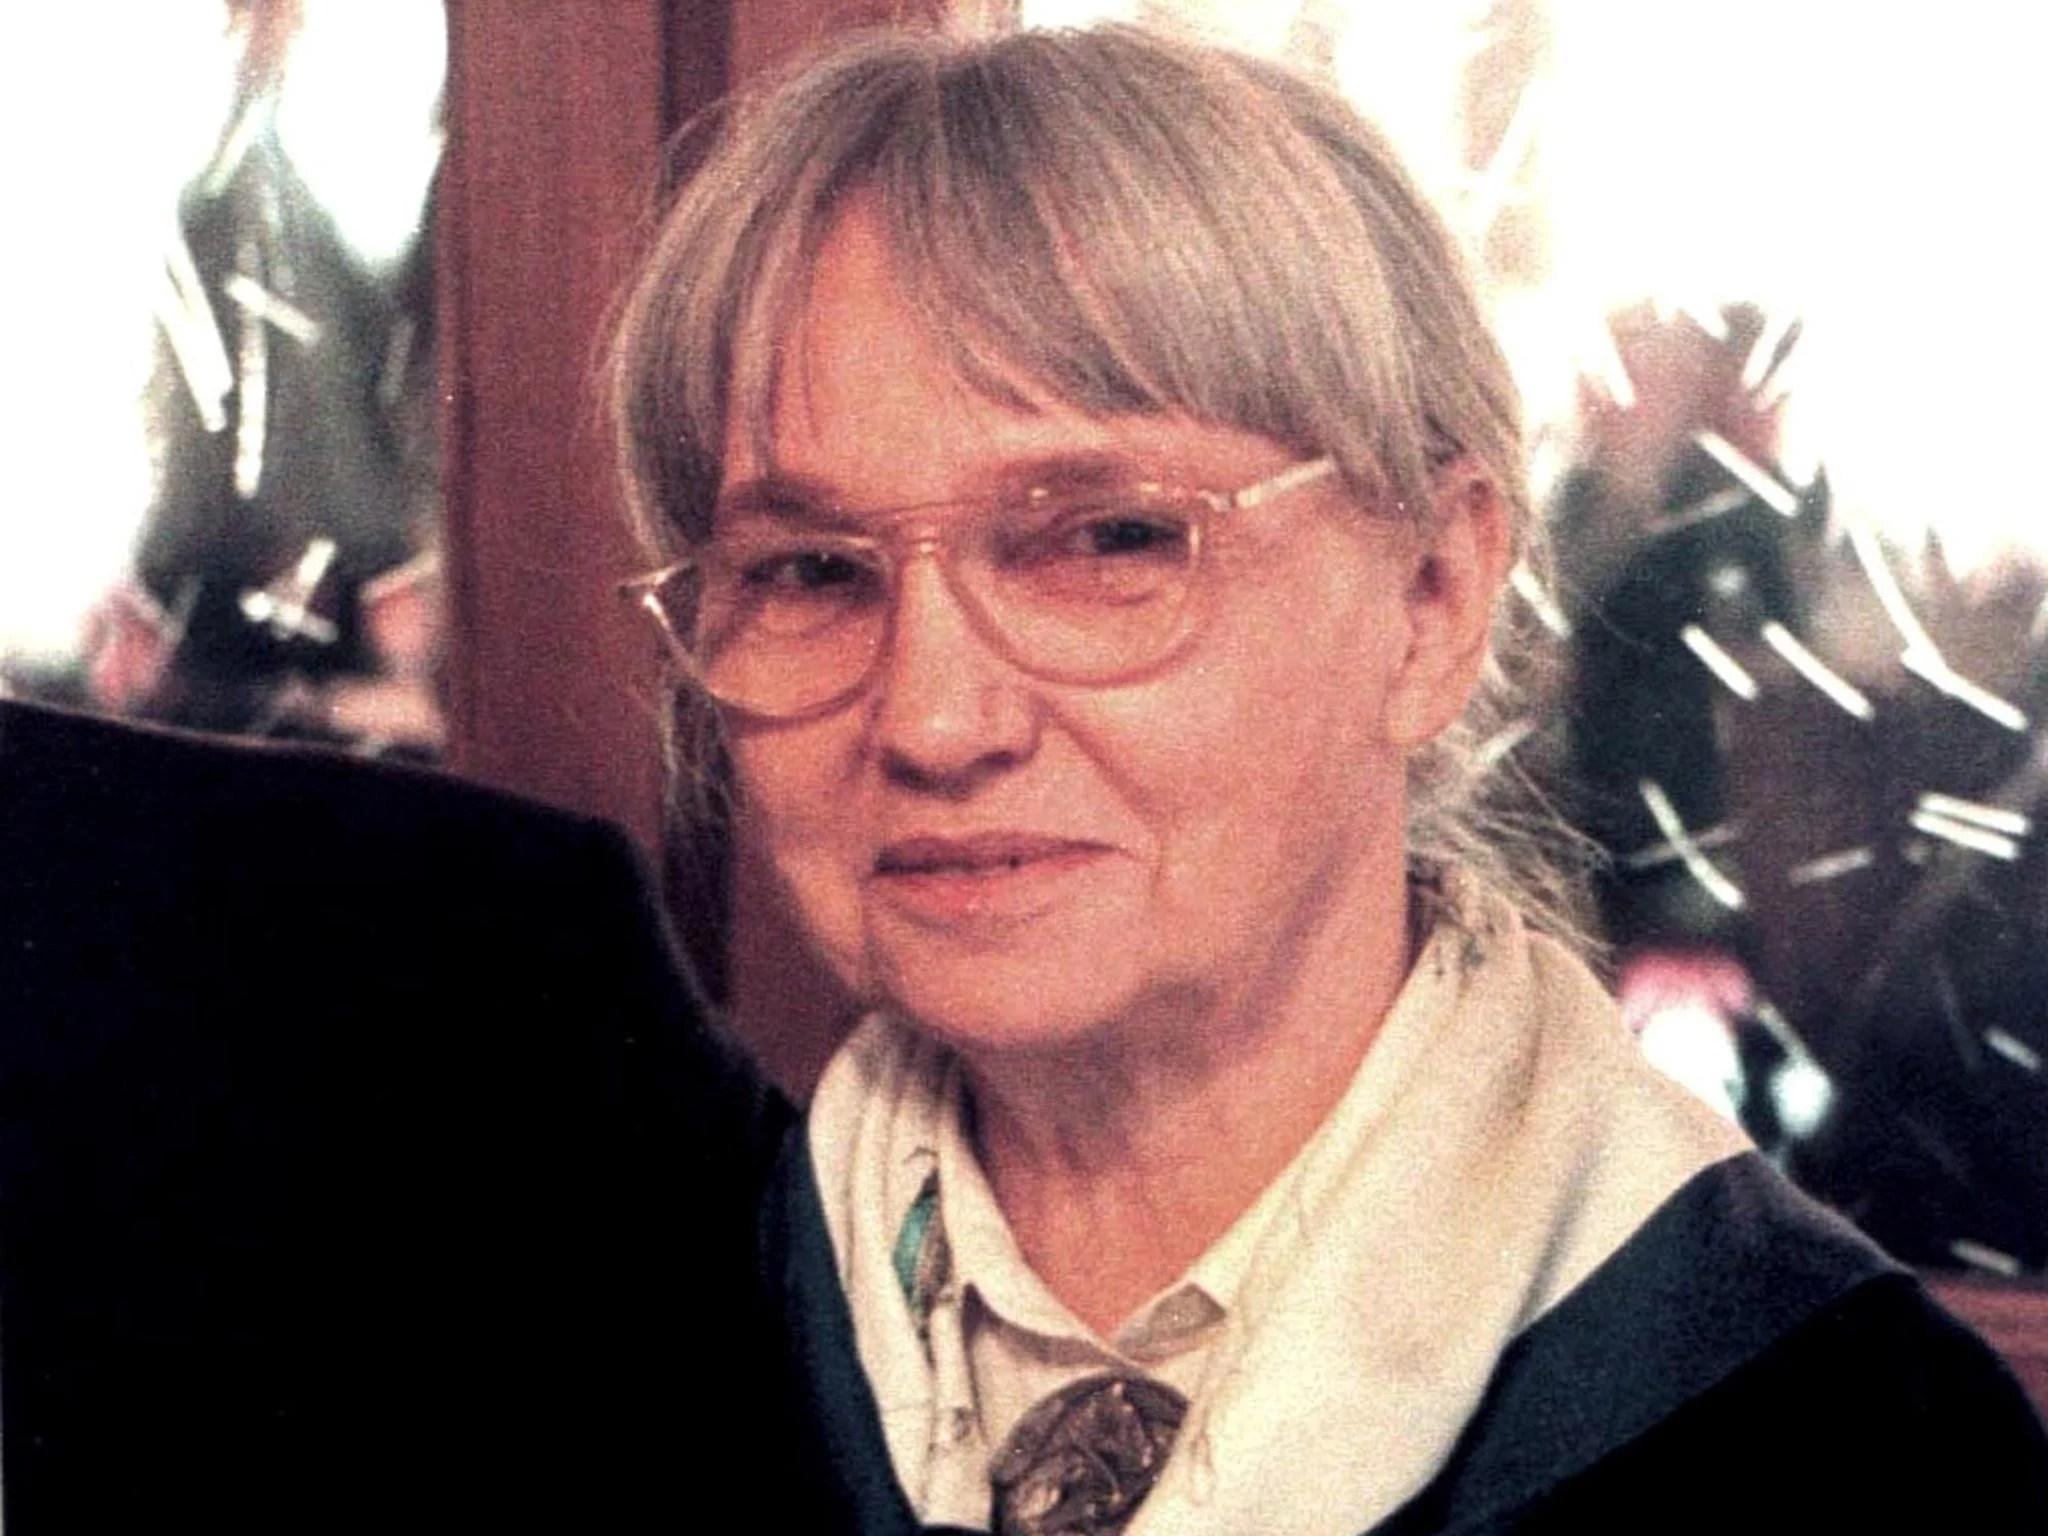 Gudrun Burwitz worked for the German Bundesnachrichtendienst agency from 1961 to 1963, it has been revealed